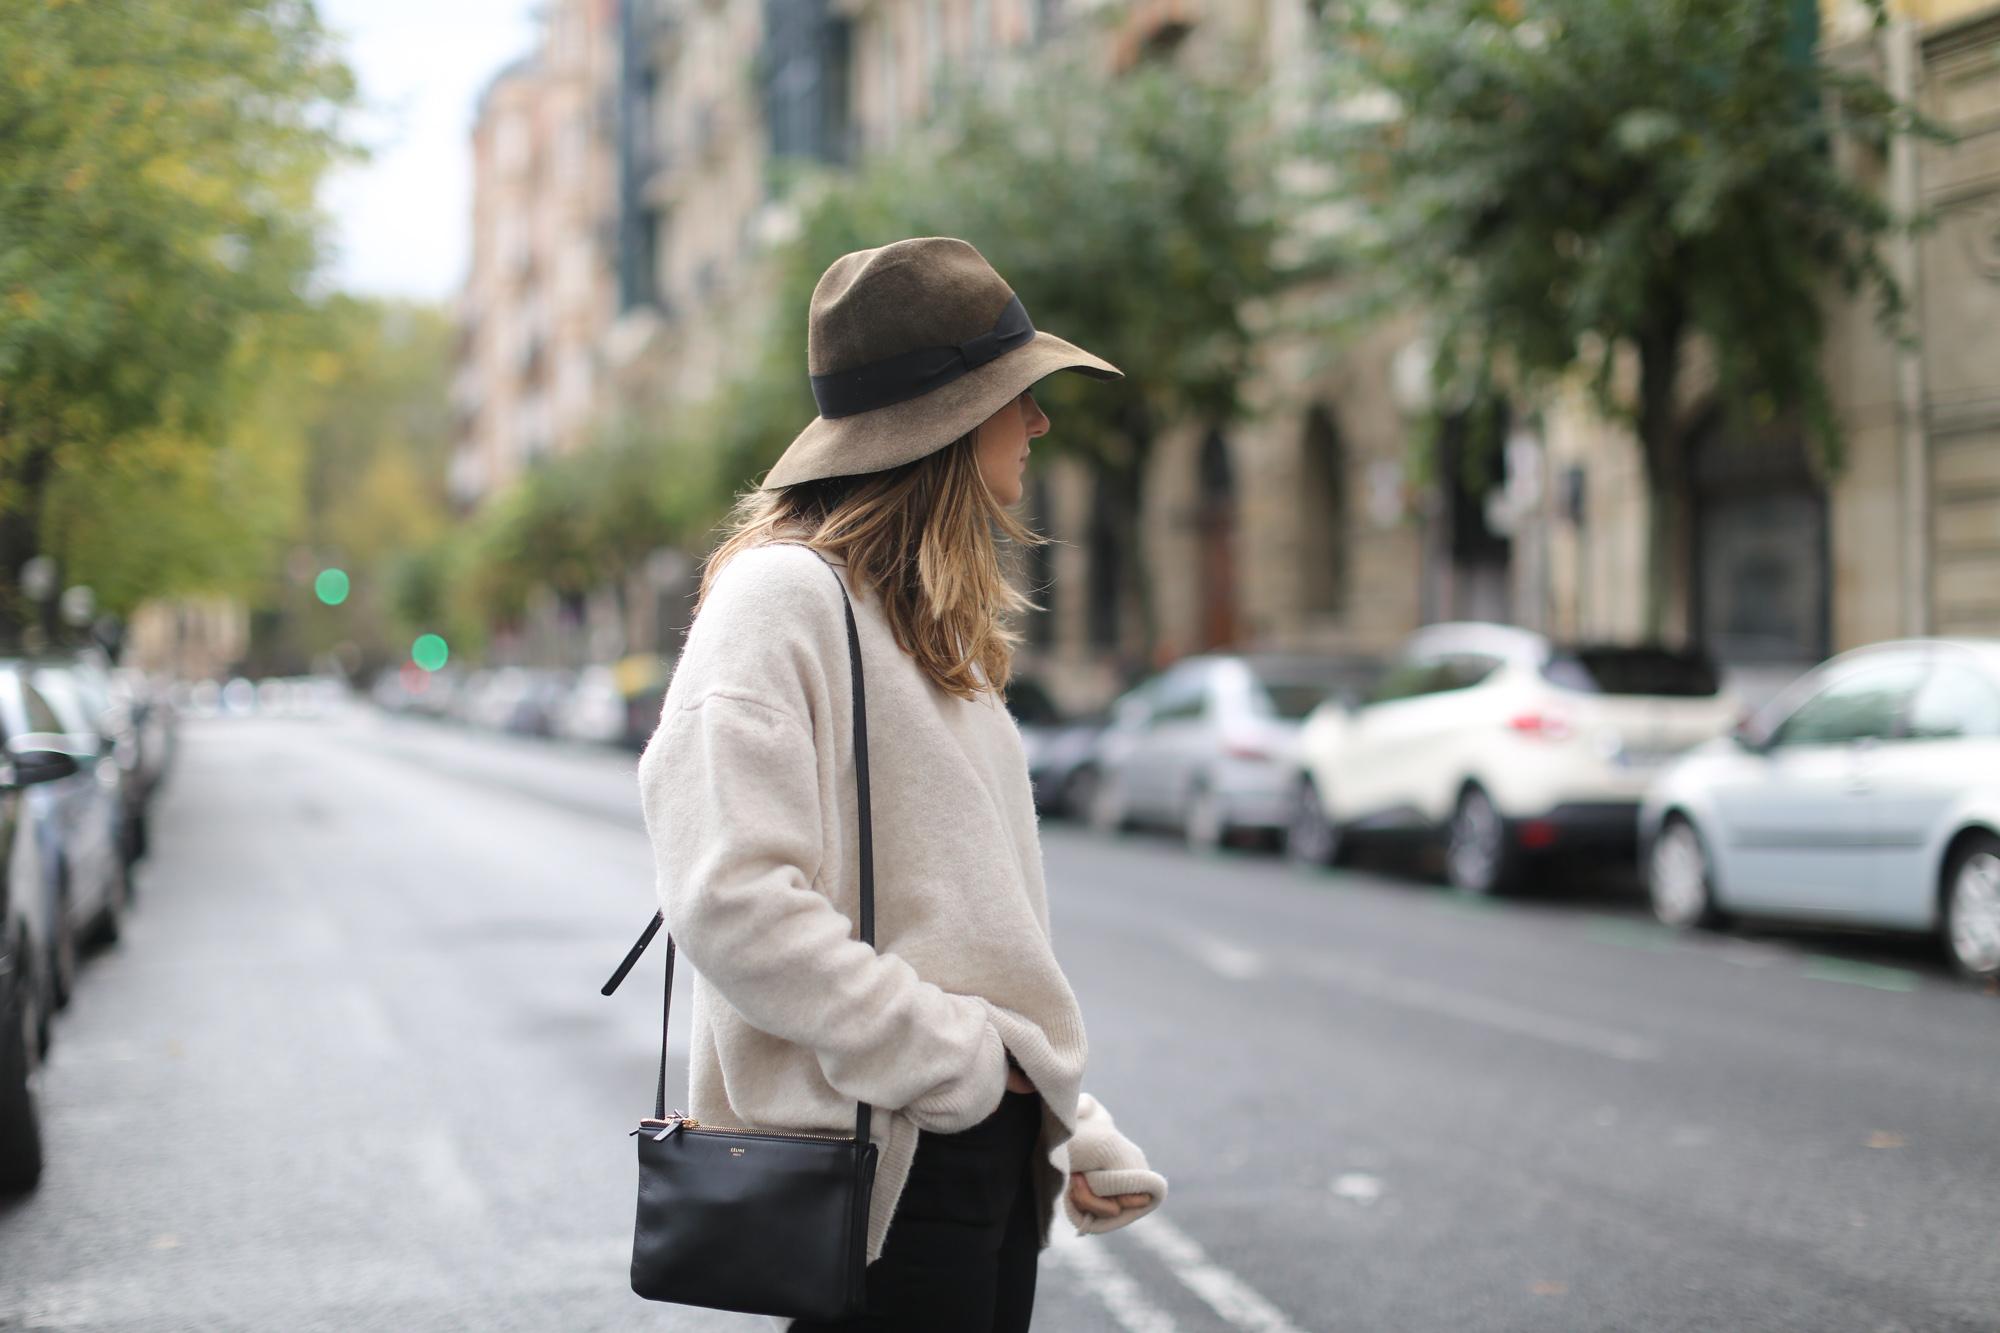 Clochet-streetstyle-celine-trio-bag-zara-oversized-knit-fedora-hat-3